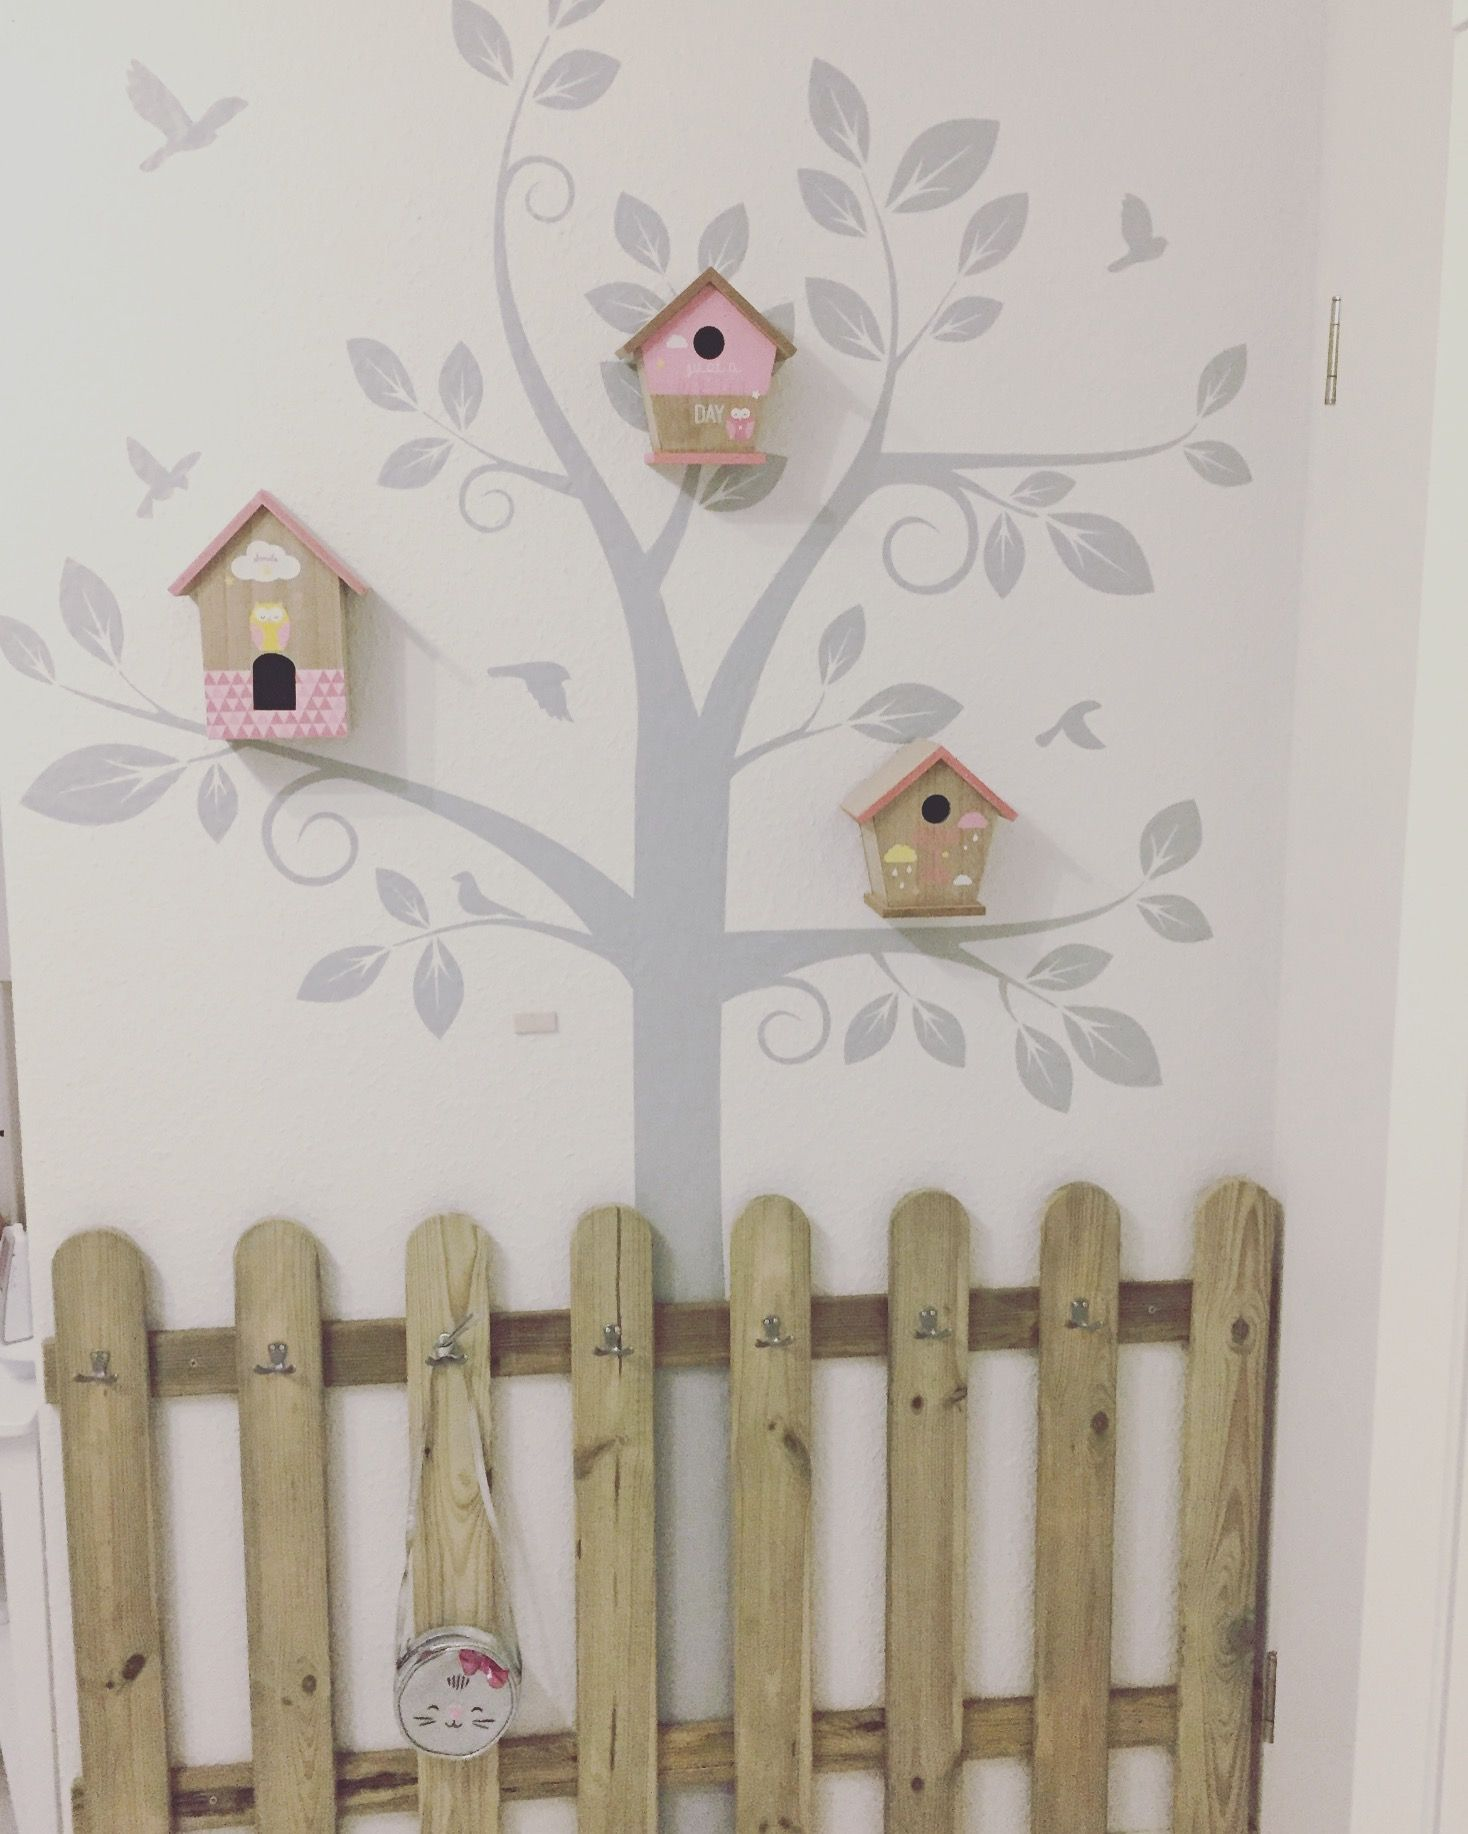 kinderzimmer kinderzimmerdeko kindergarderobe diy - Kinderzimmer Deko